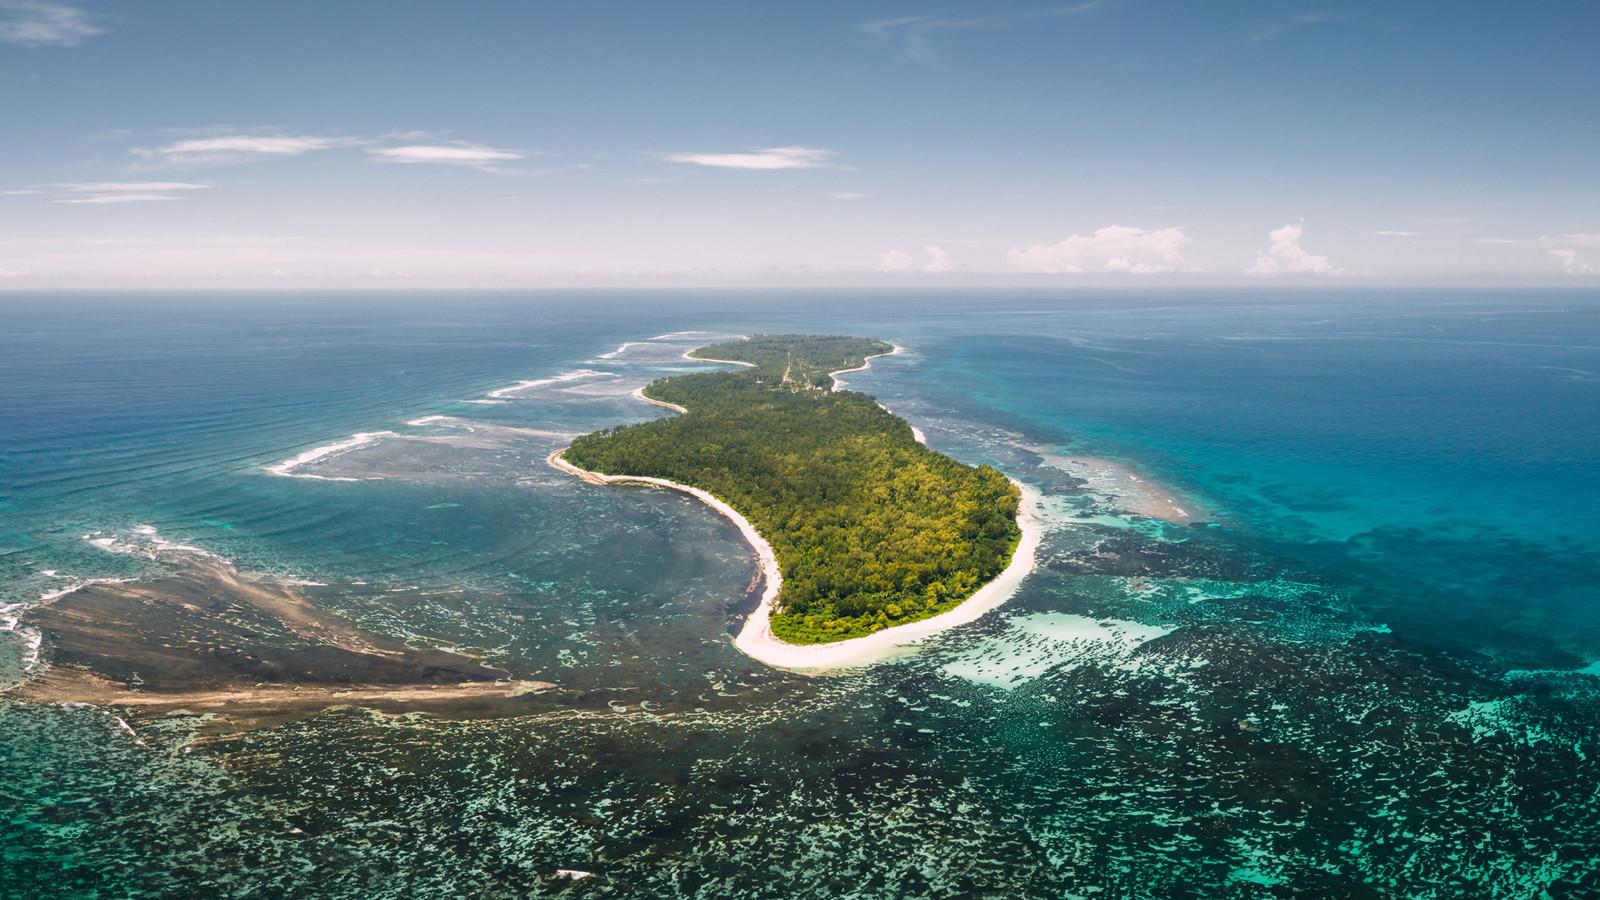 news-main-four-seasons-resort-seychelles-at-desroches-island-re-opens.1609781898.jpg